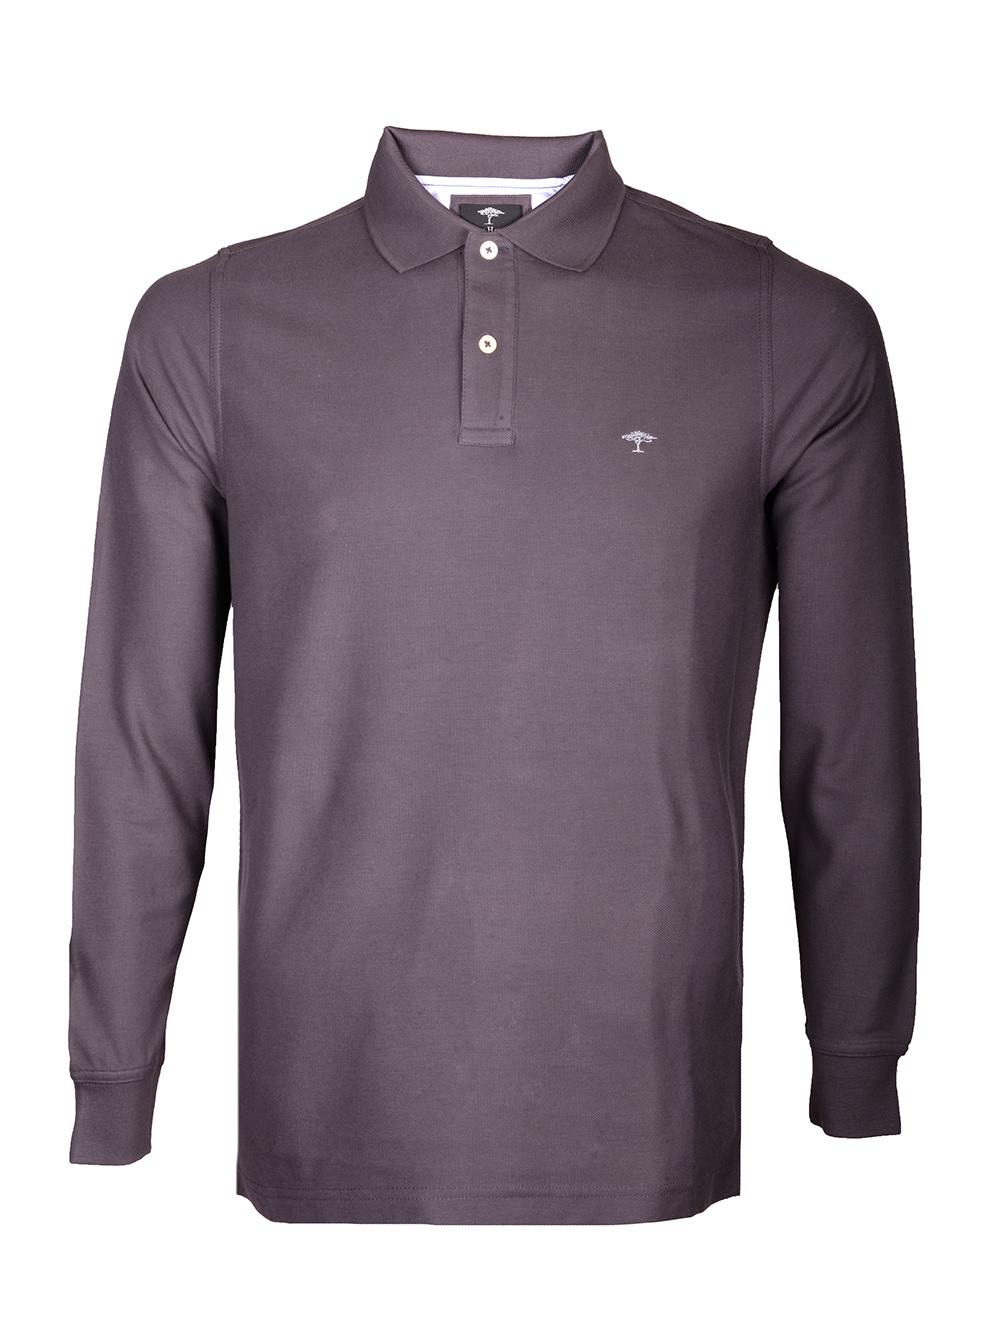 FYNCH-HATTON Μπλούζα Polo 1219 1701-970 ΓΚΡΙ